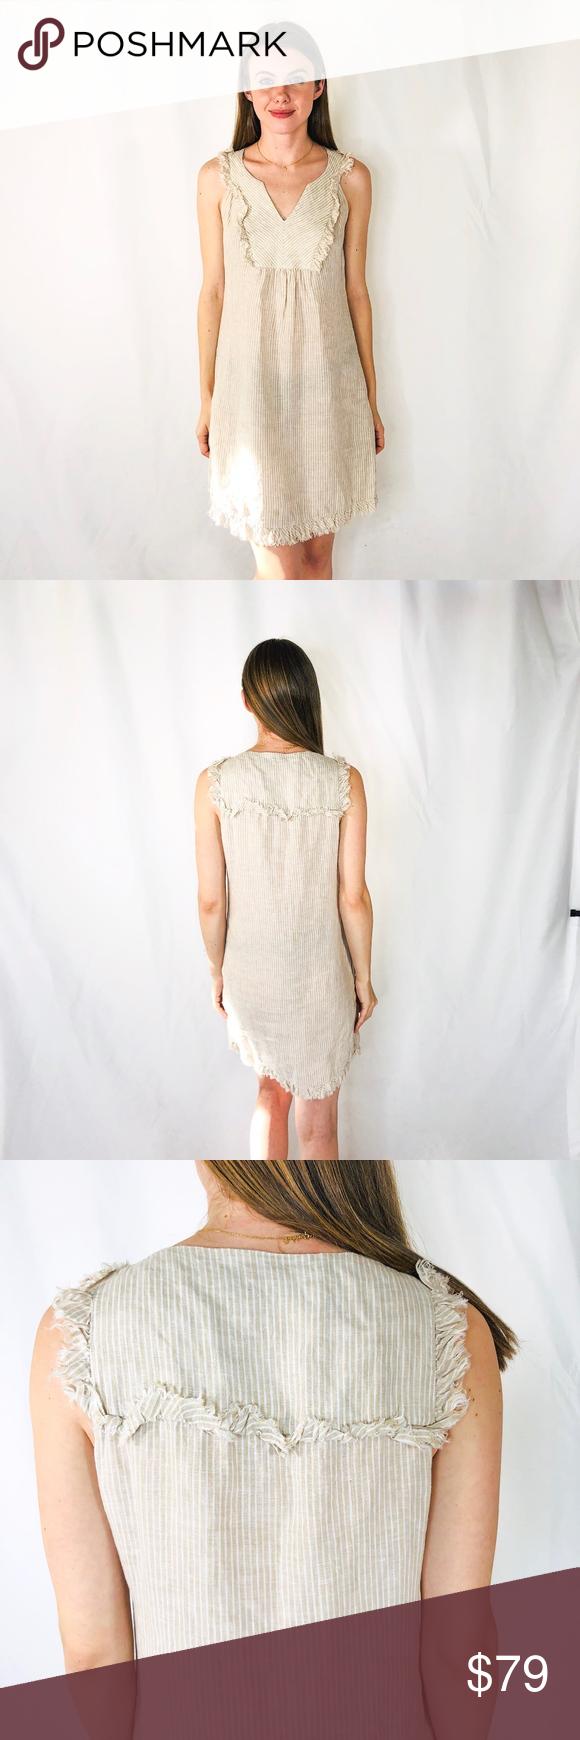 254c7ddbb13 Vineyard Vines Linen Striped Natural Mini Dress 6 Description  Easy spring  mini dress perfect for